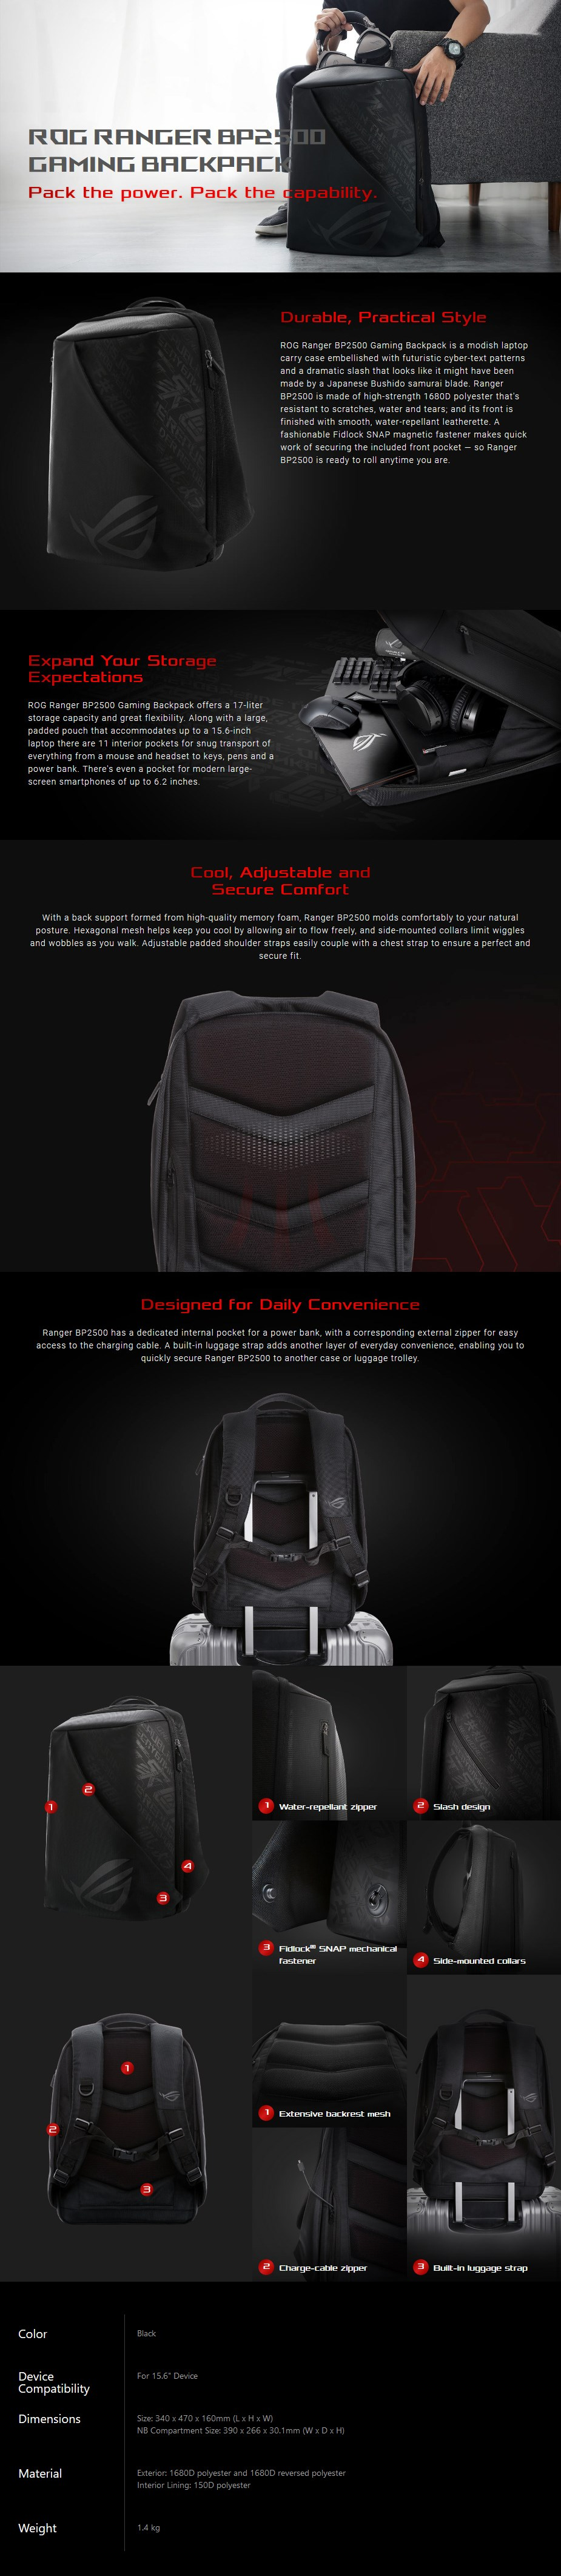 ASUS ROG RANGER BP2500G Backpack - Overview 1